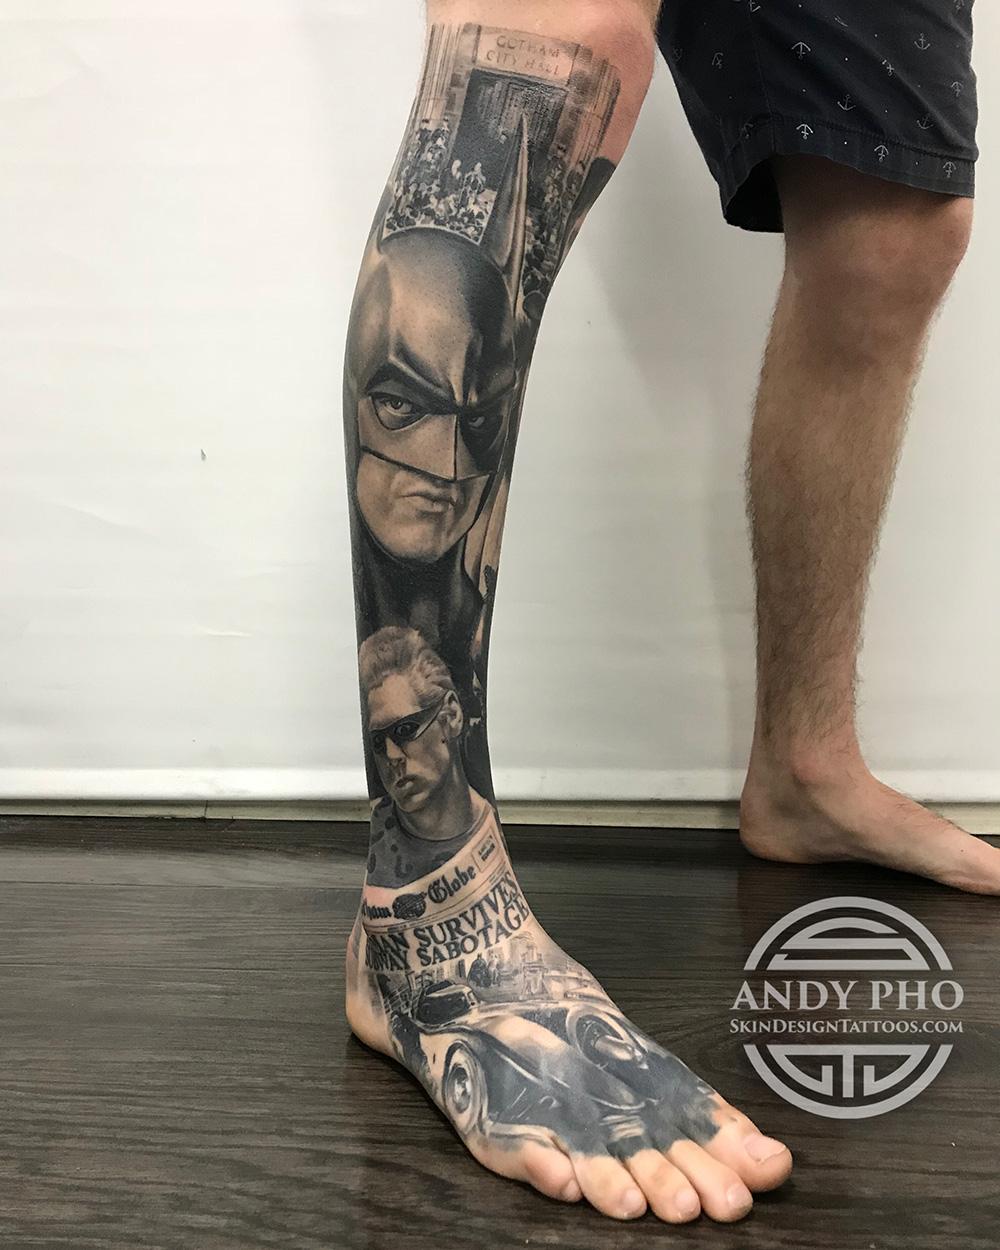 Andy Pho Batman 1989 2 tattoo.JPG